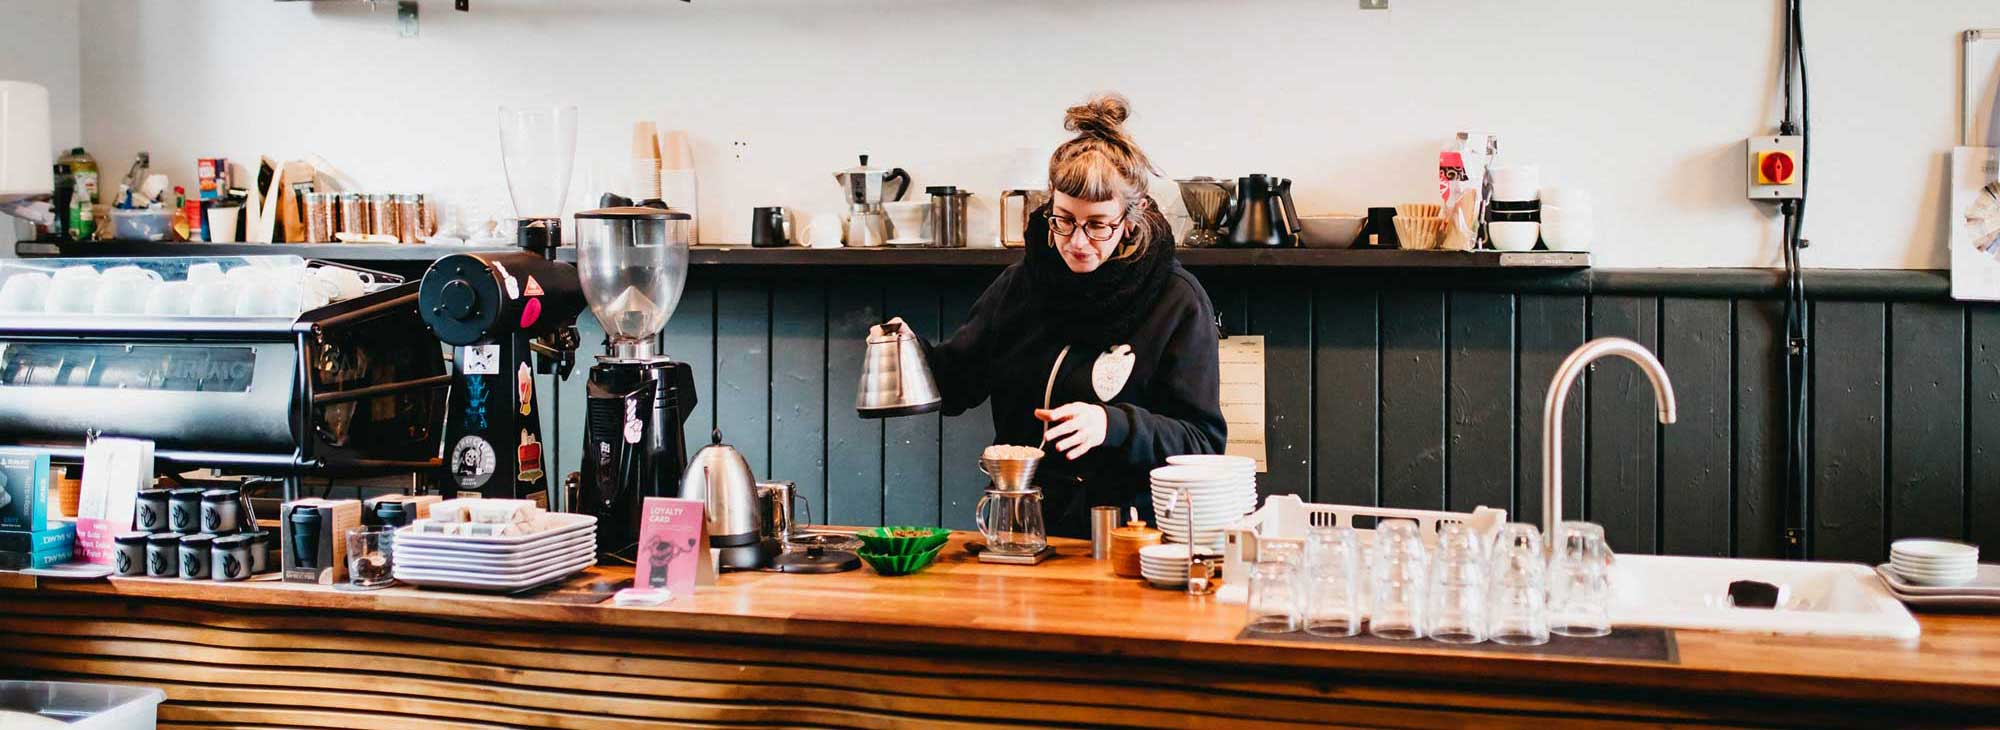 coffee, festival, brighton, hove, sussex, south, coast, england, uk, talks, cupping, latte, art, throwdown, roasters, shops, food, drink,